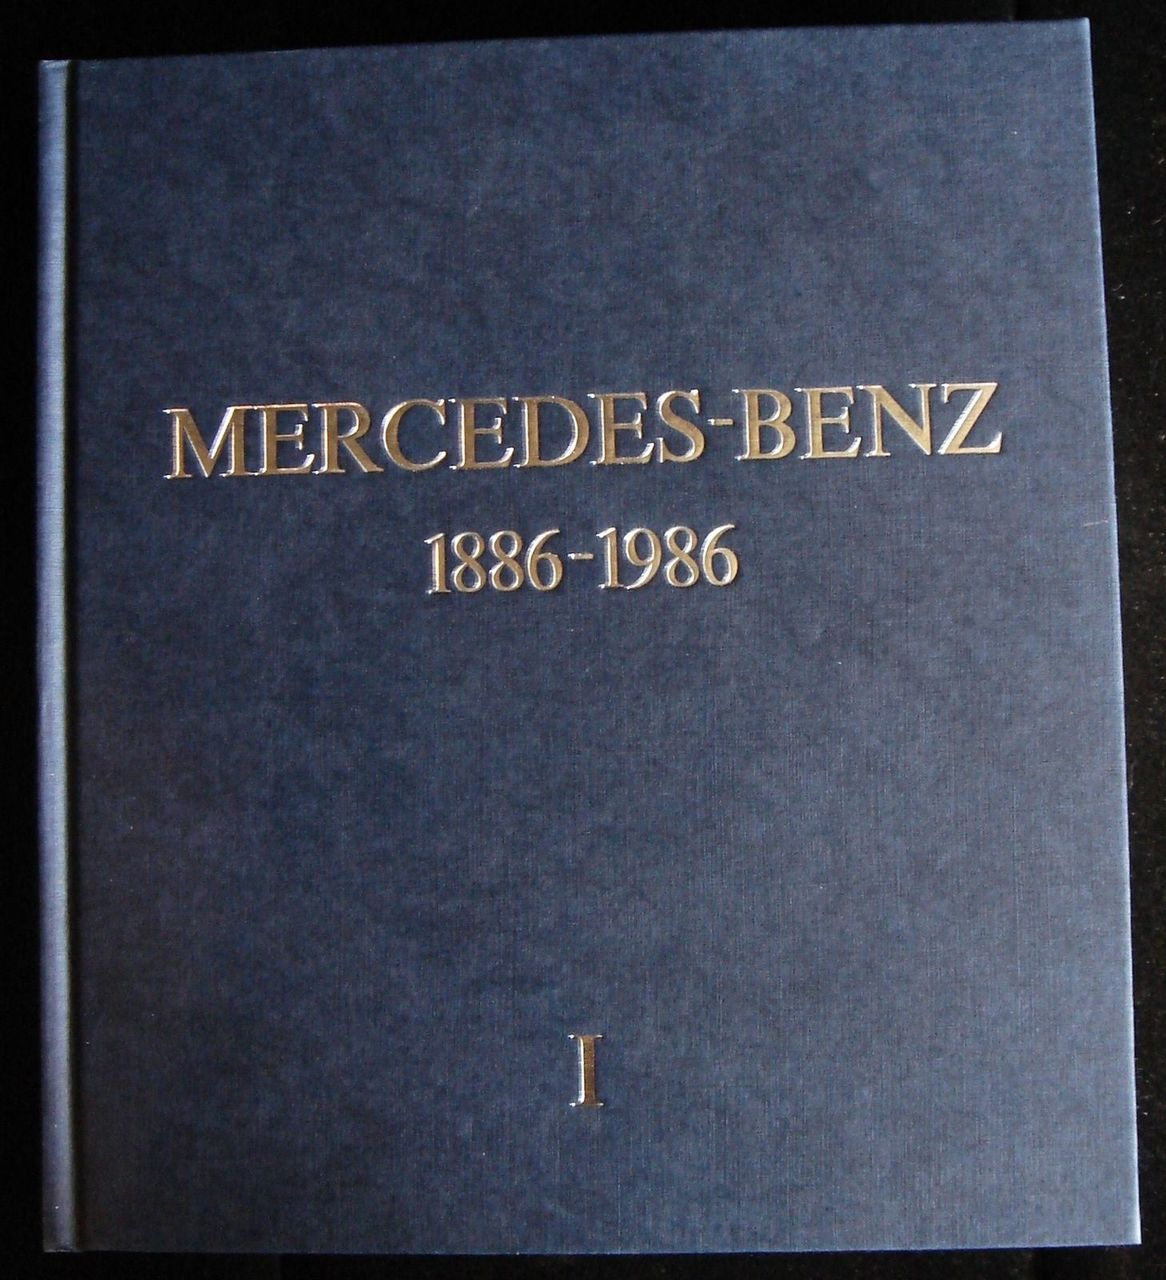 MERCEDES BENZ 1886-1986, by Jurgen Lewandowski - 1986